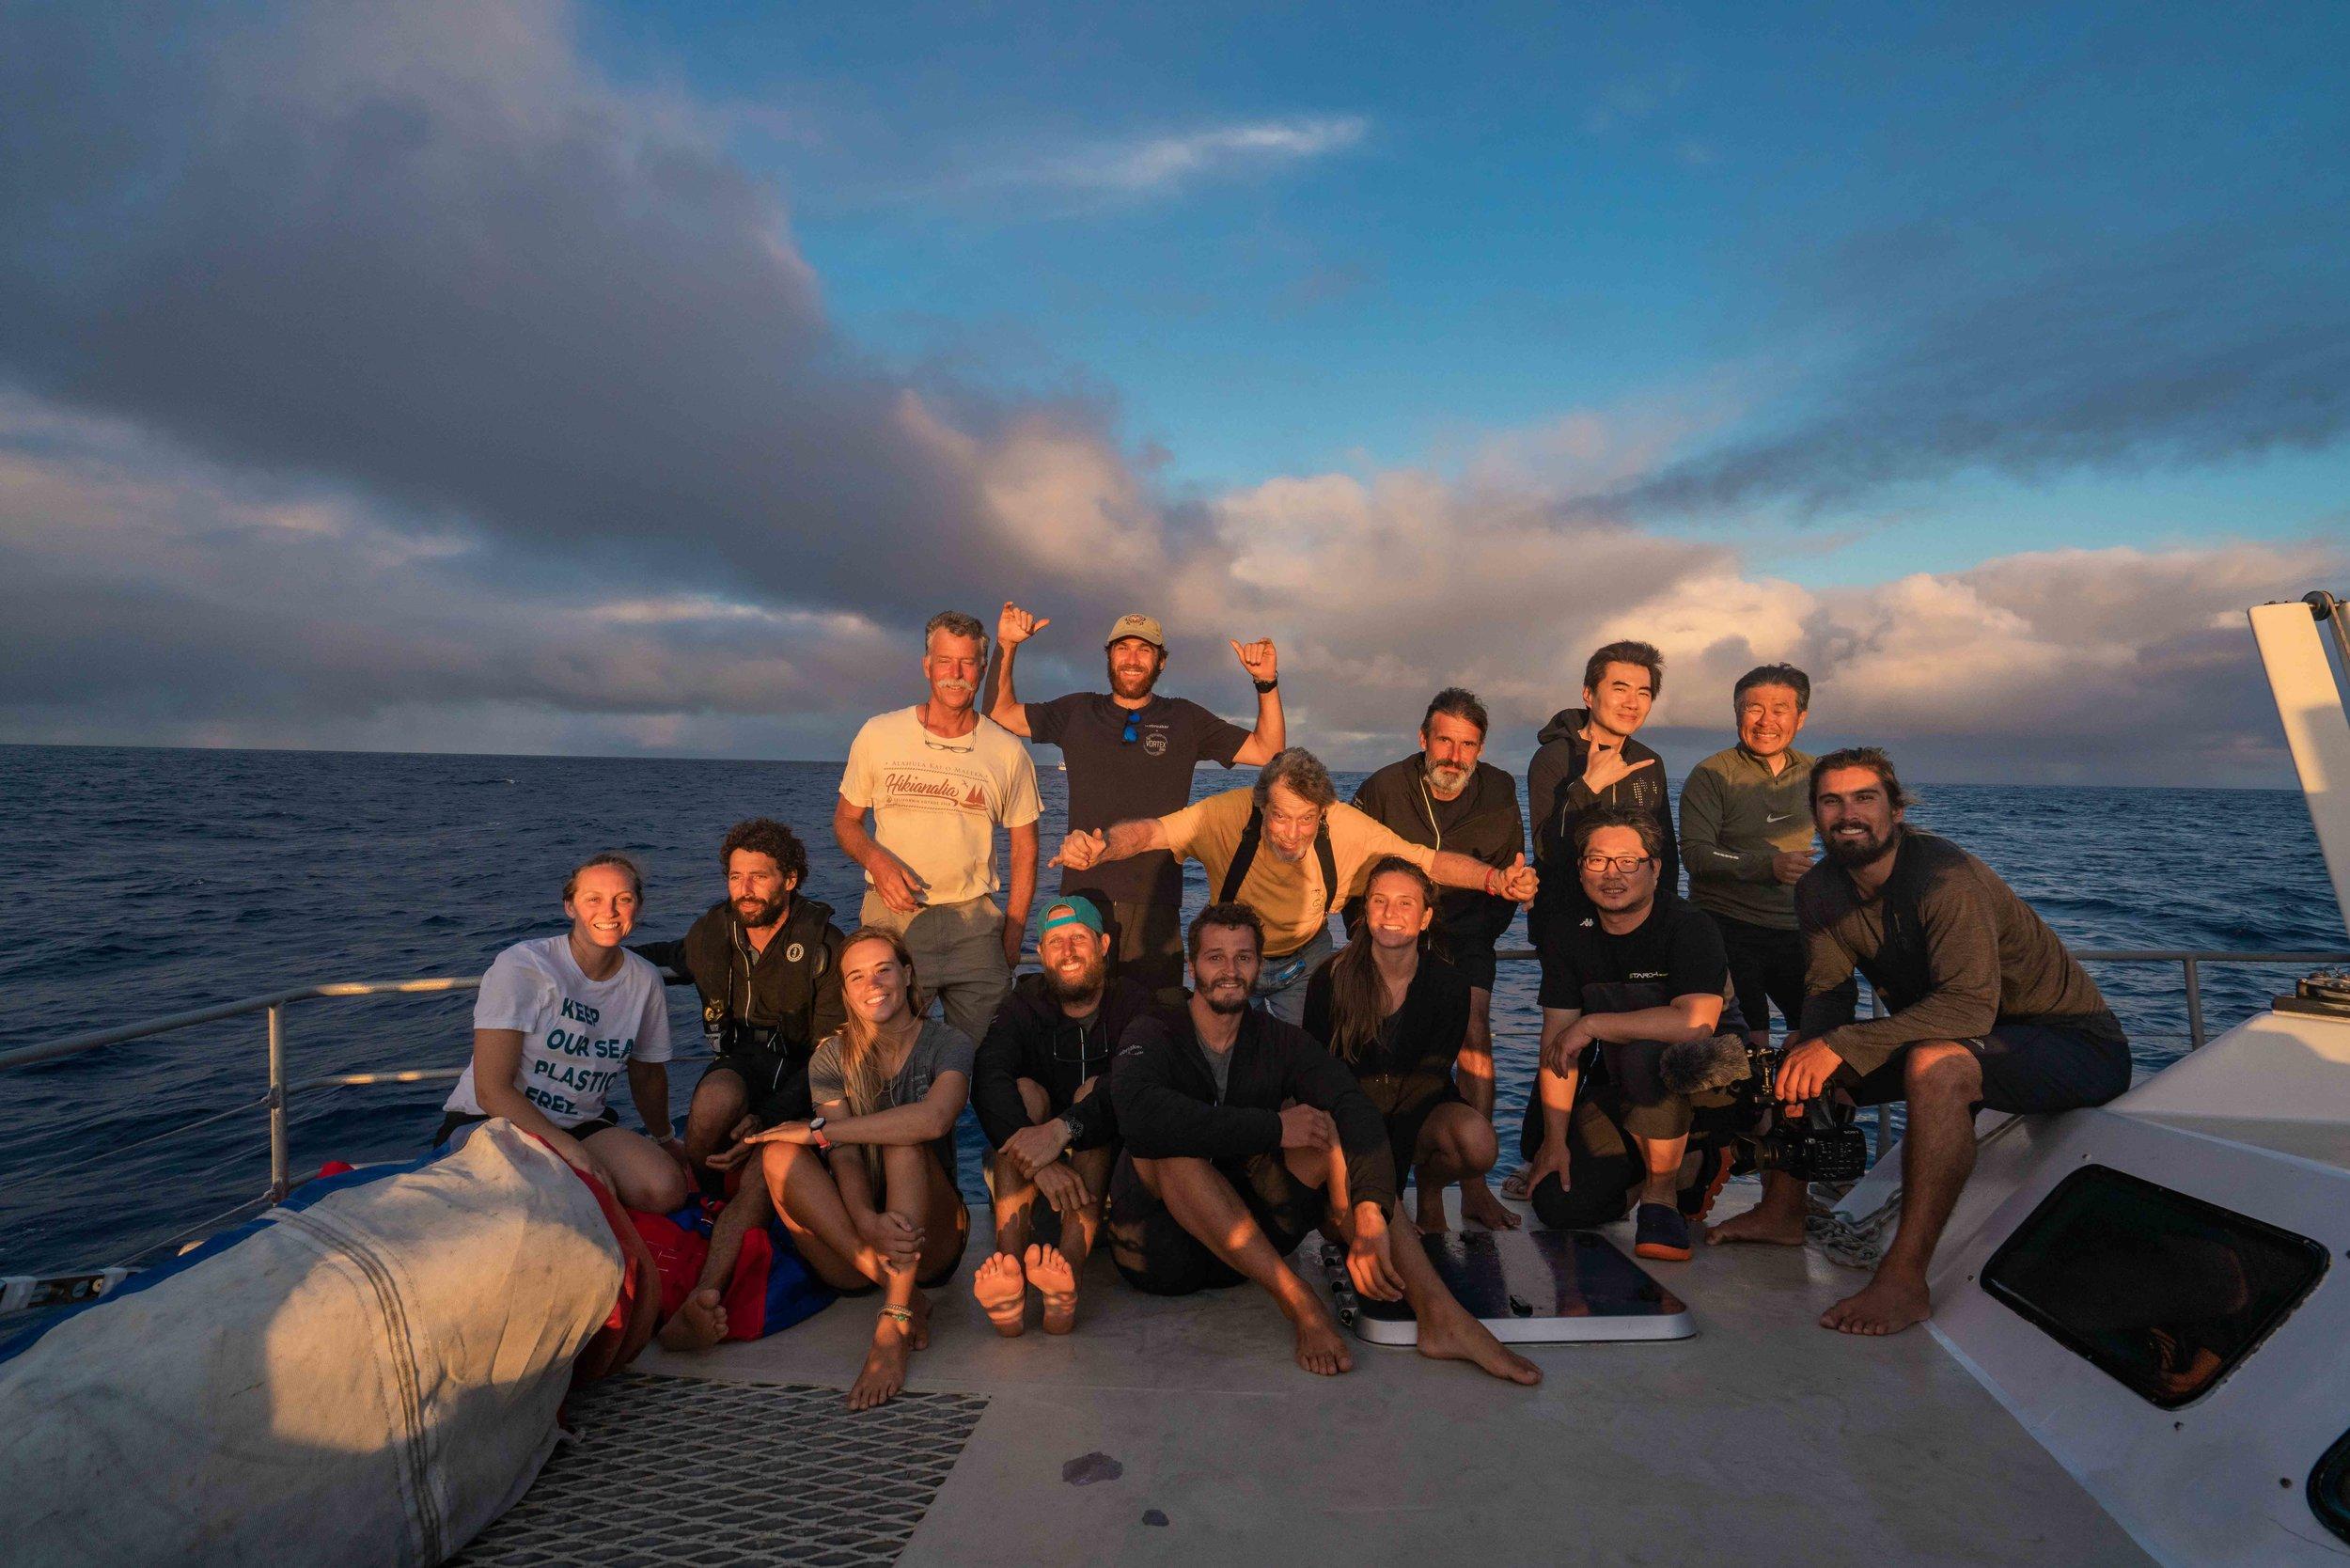 19-07-22 - Group photo - @joshmunoz-1.jpg